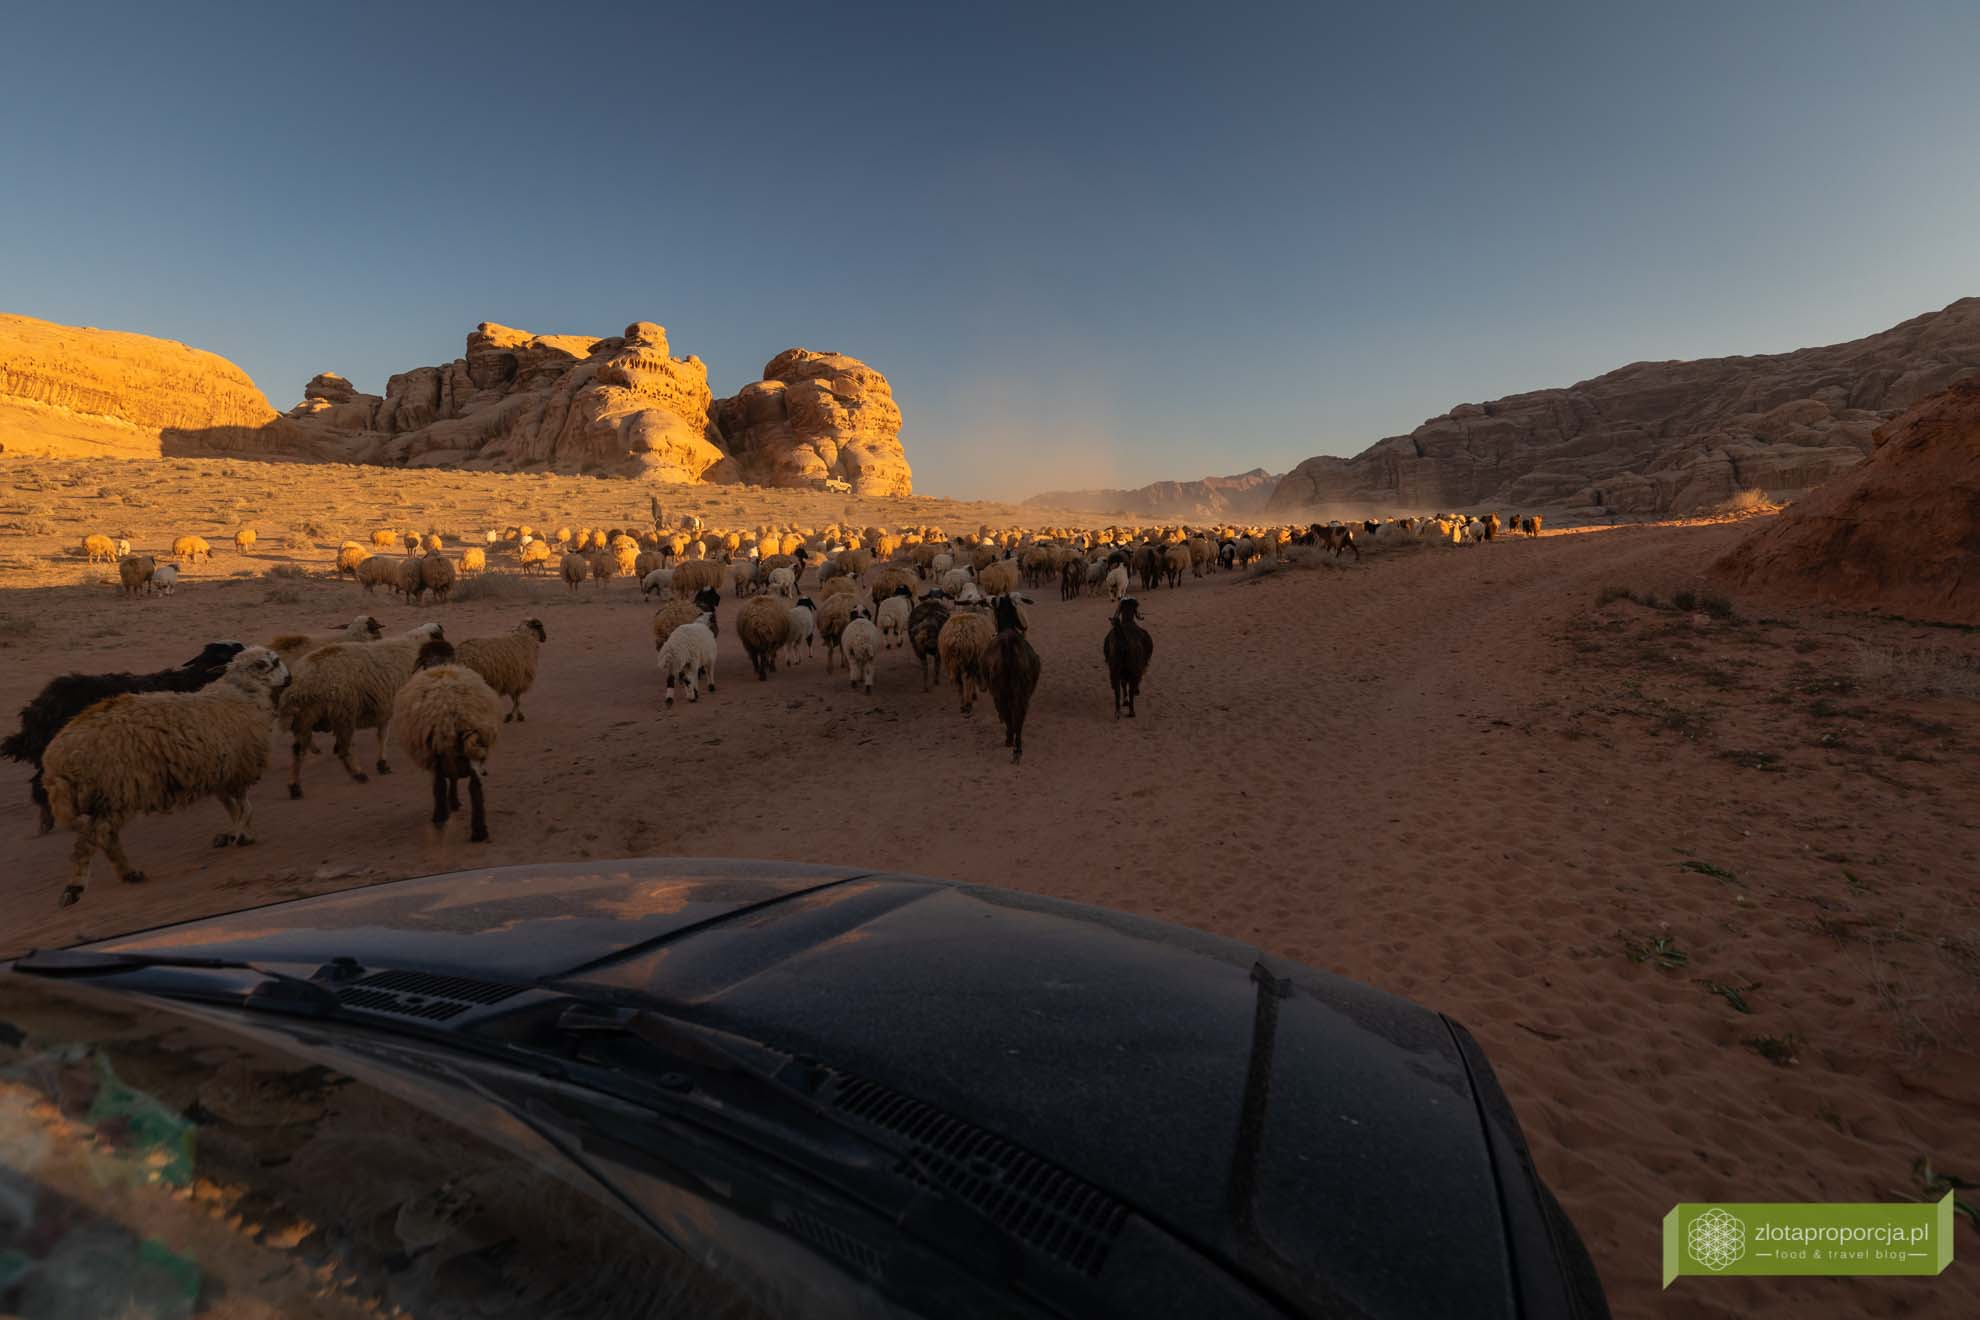 Wadi Rum, pustynia Wadi Rum, Jordania, pustynia Jordania; Wadi rum wycieczka, Wadi Rum zwiedzanie, Jordania atrakcje; owce, stado owiec Wadi Rum;